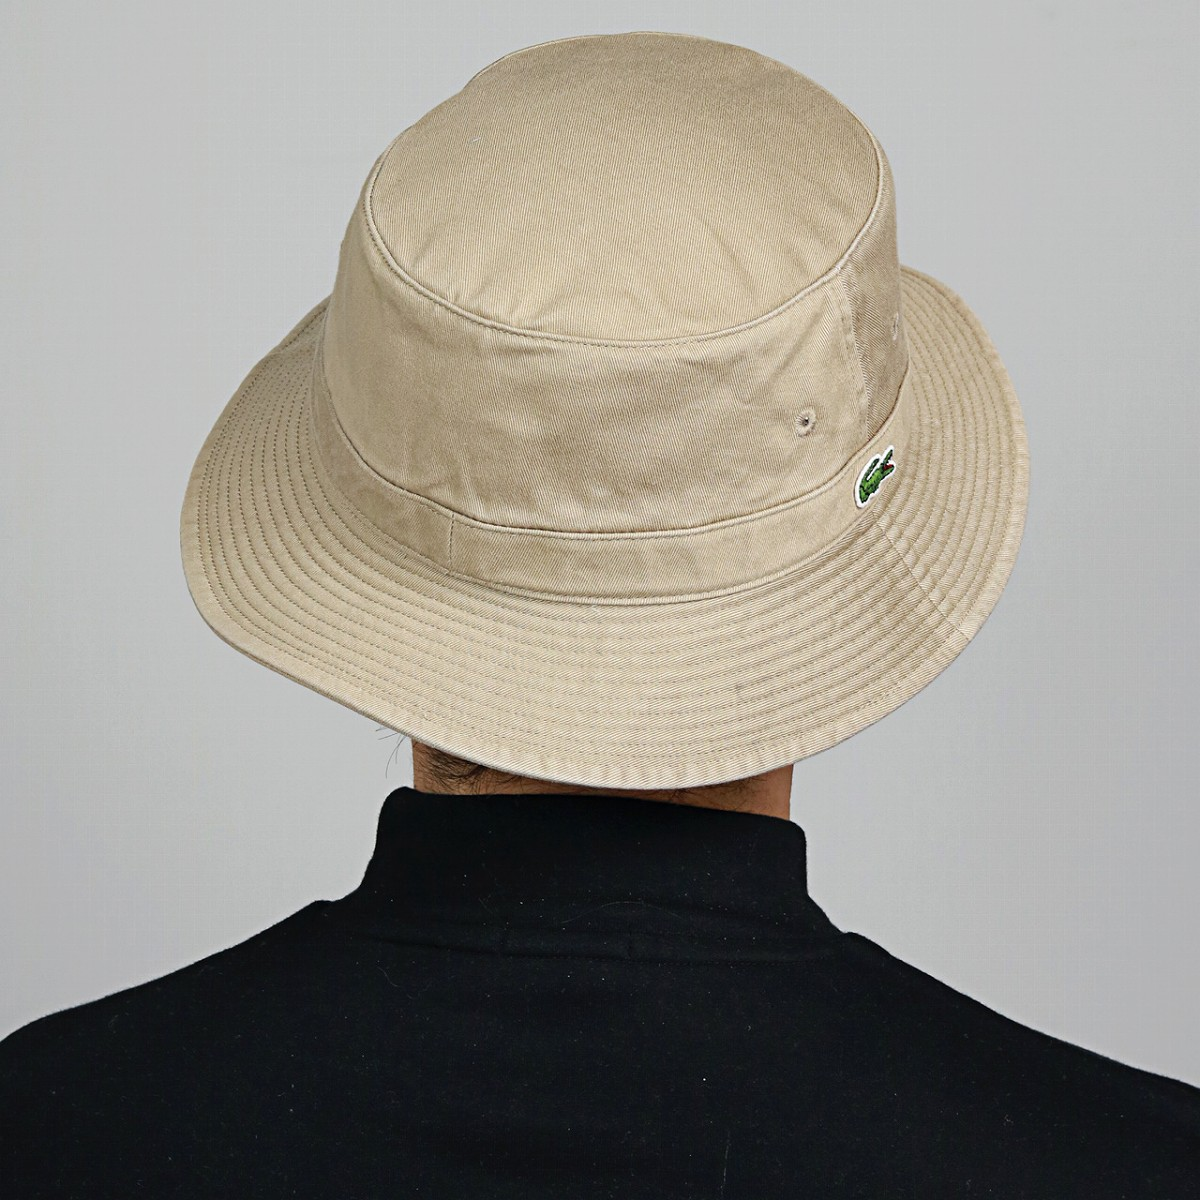 1c17cee5e9bc43 ELEHELM HAT STORE: LACOSTE bucket Hat Lacoste Hat Safari Hat beige ...